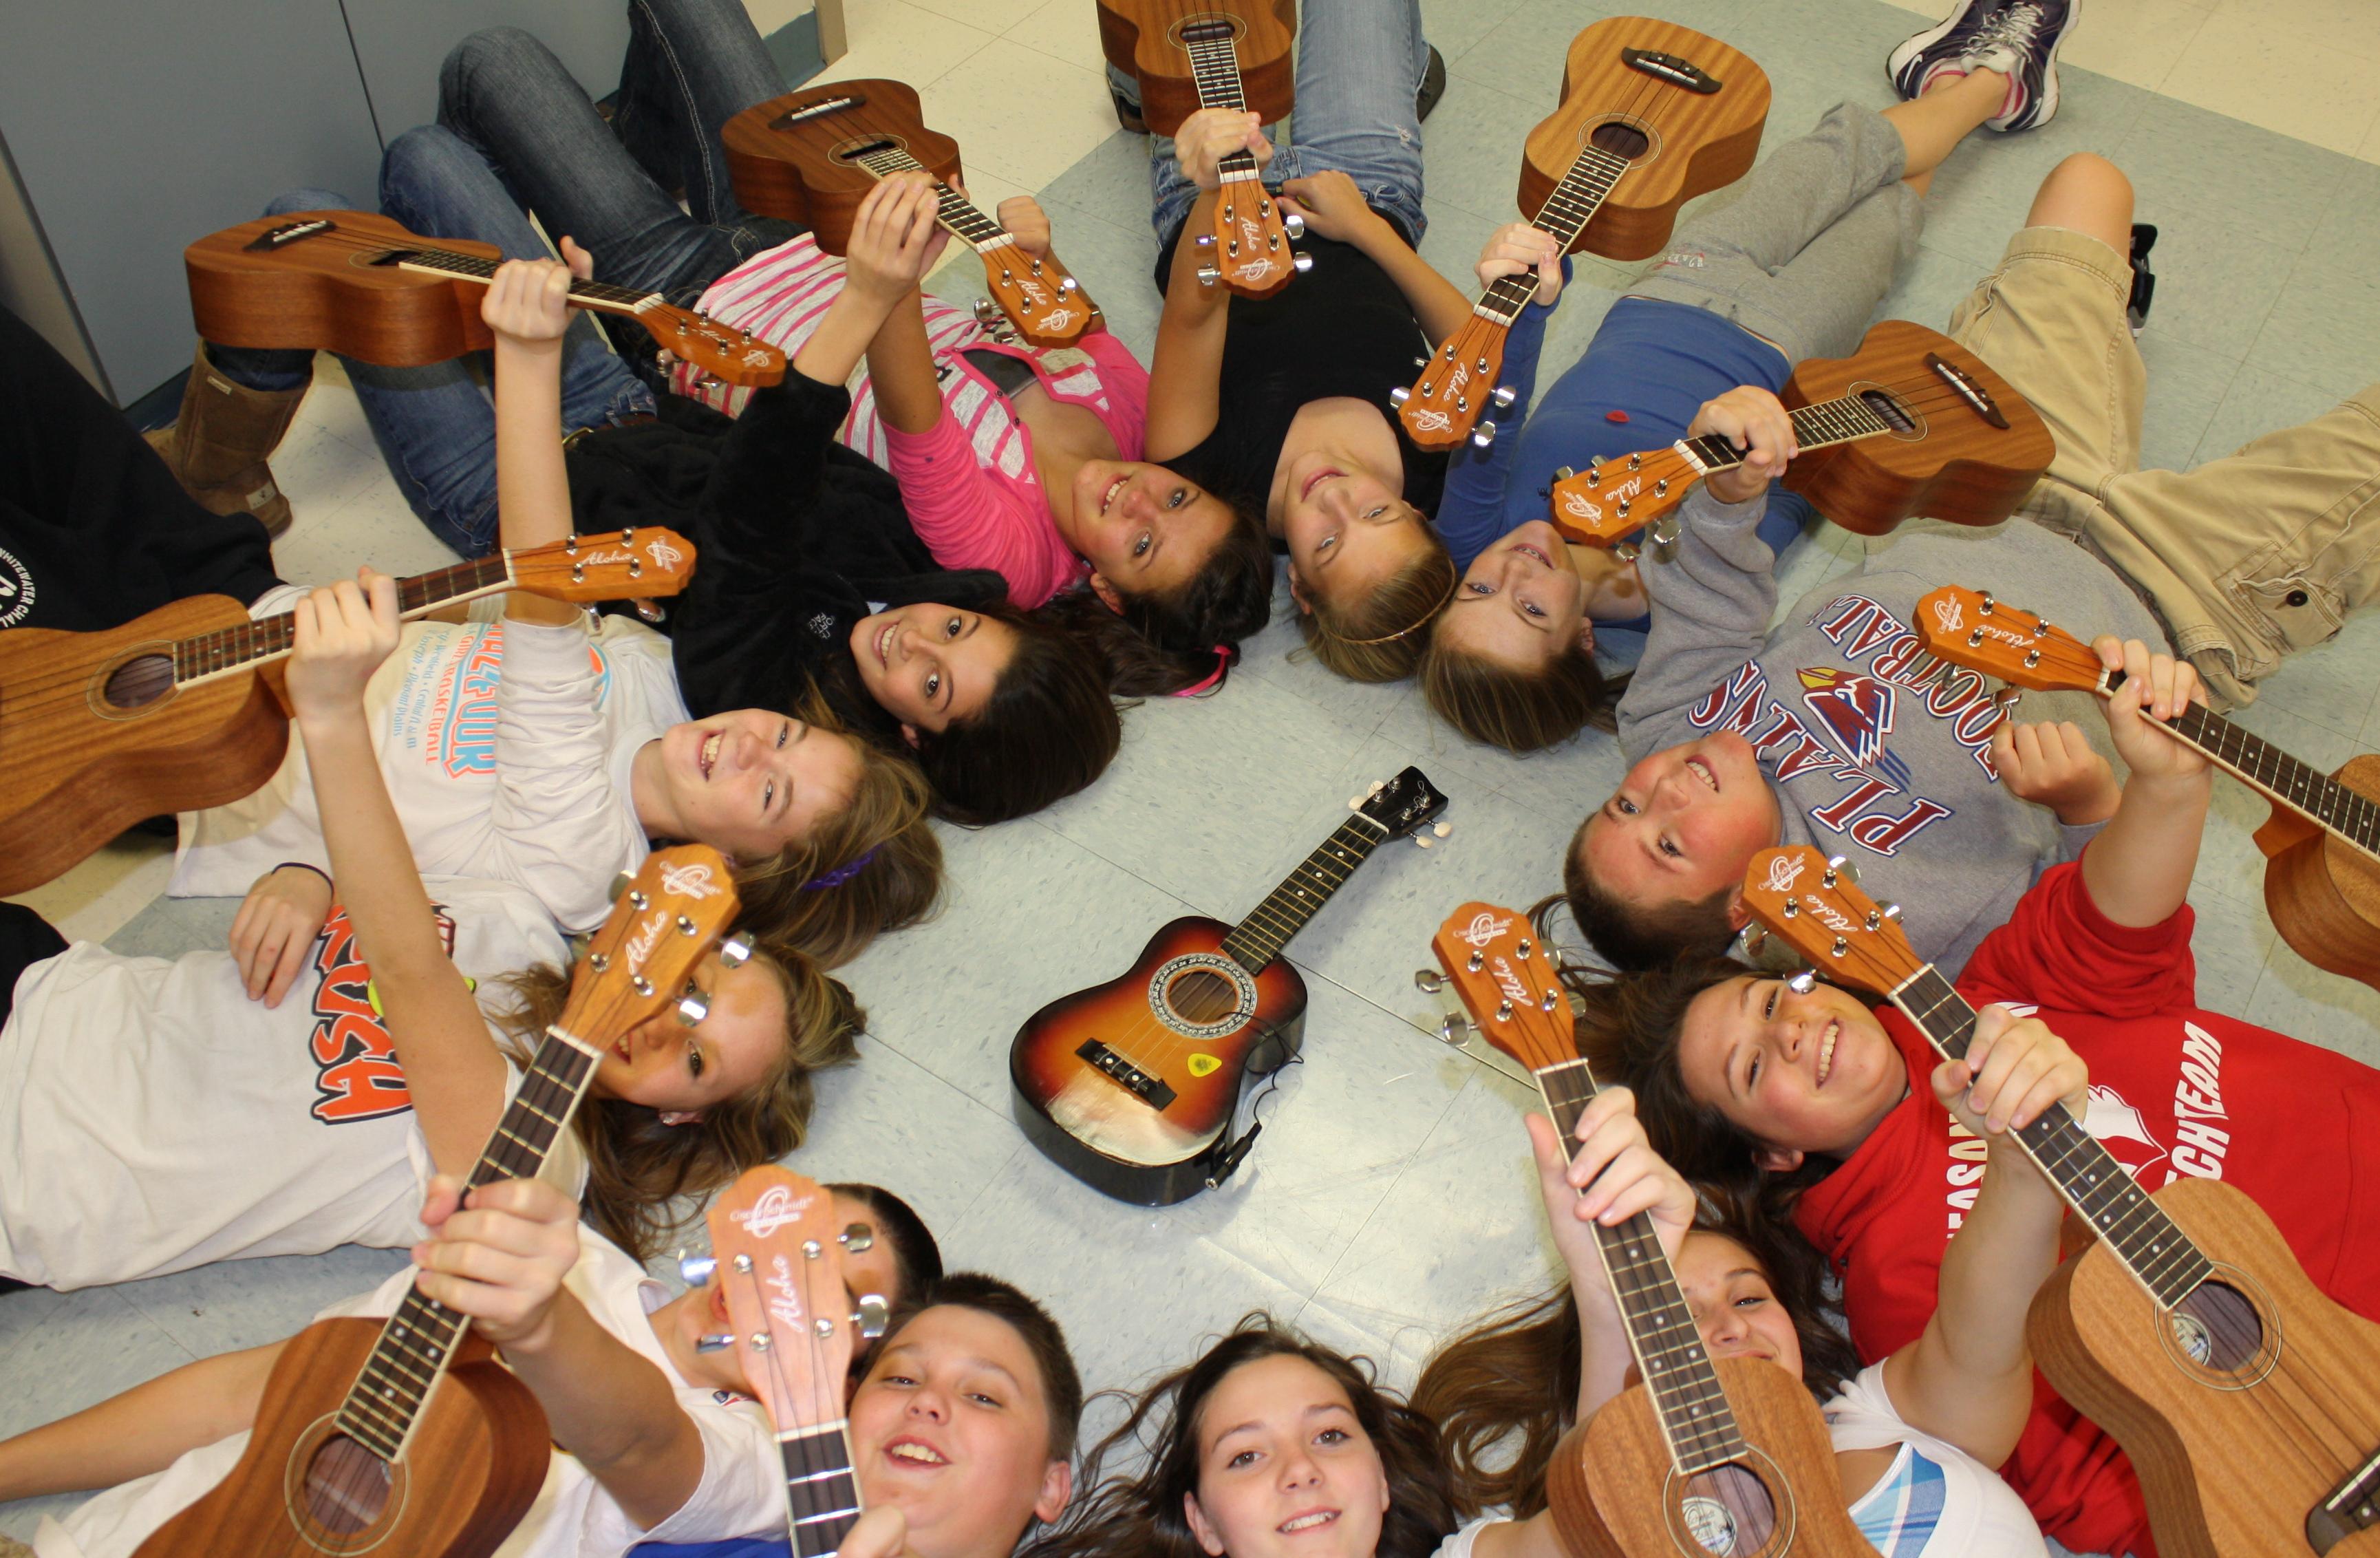 Ukulele Lessons at Northwest School of Music | Fun activities for kids in Salem, Oregon